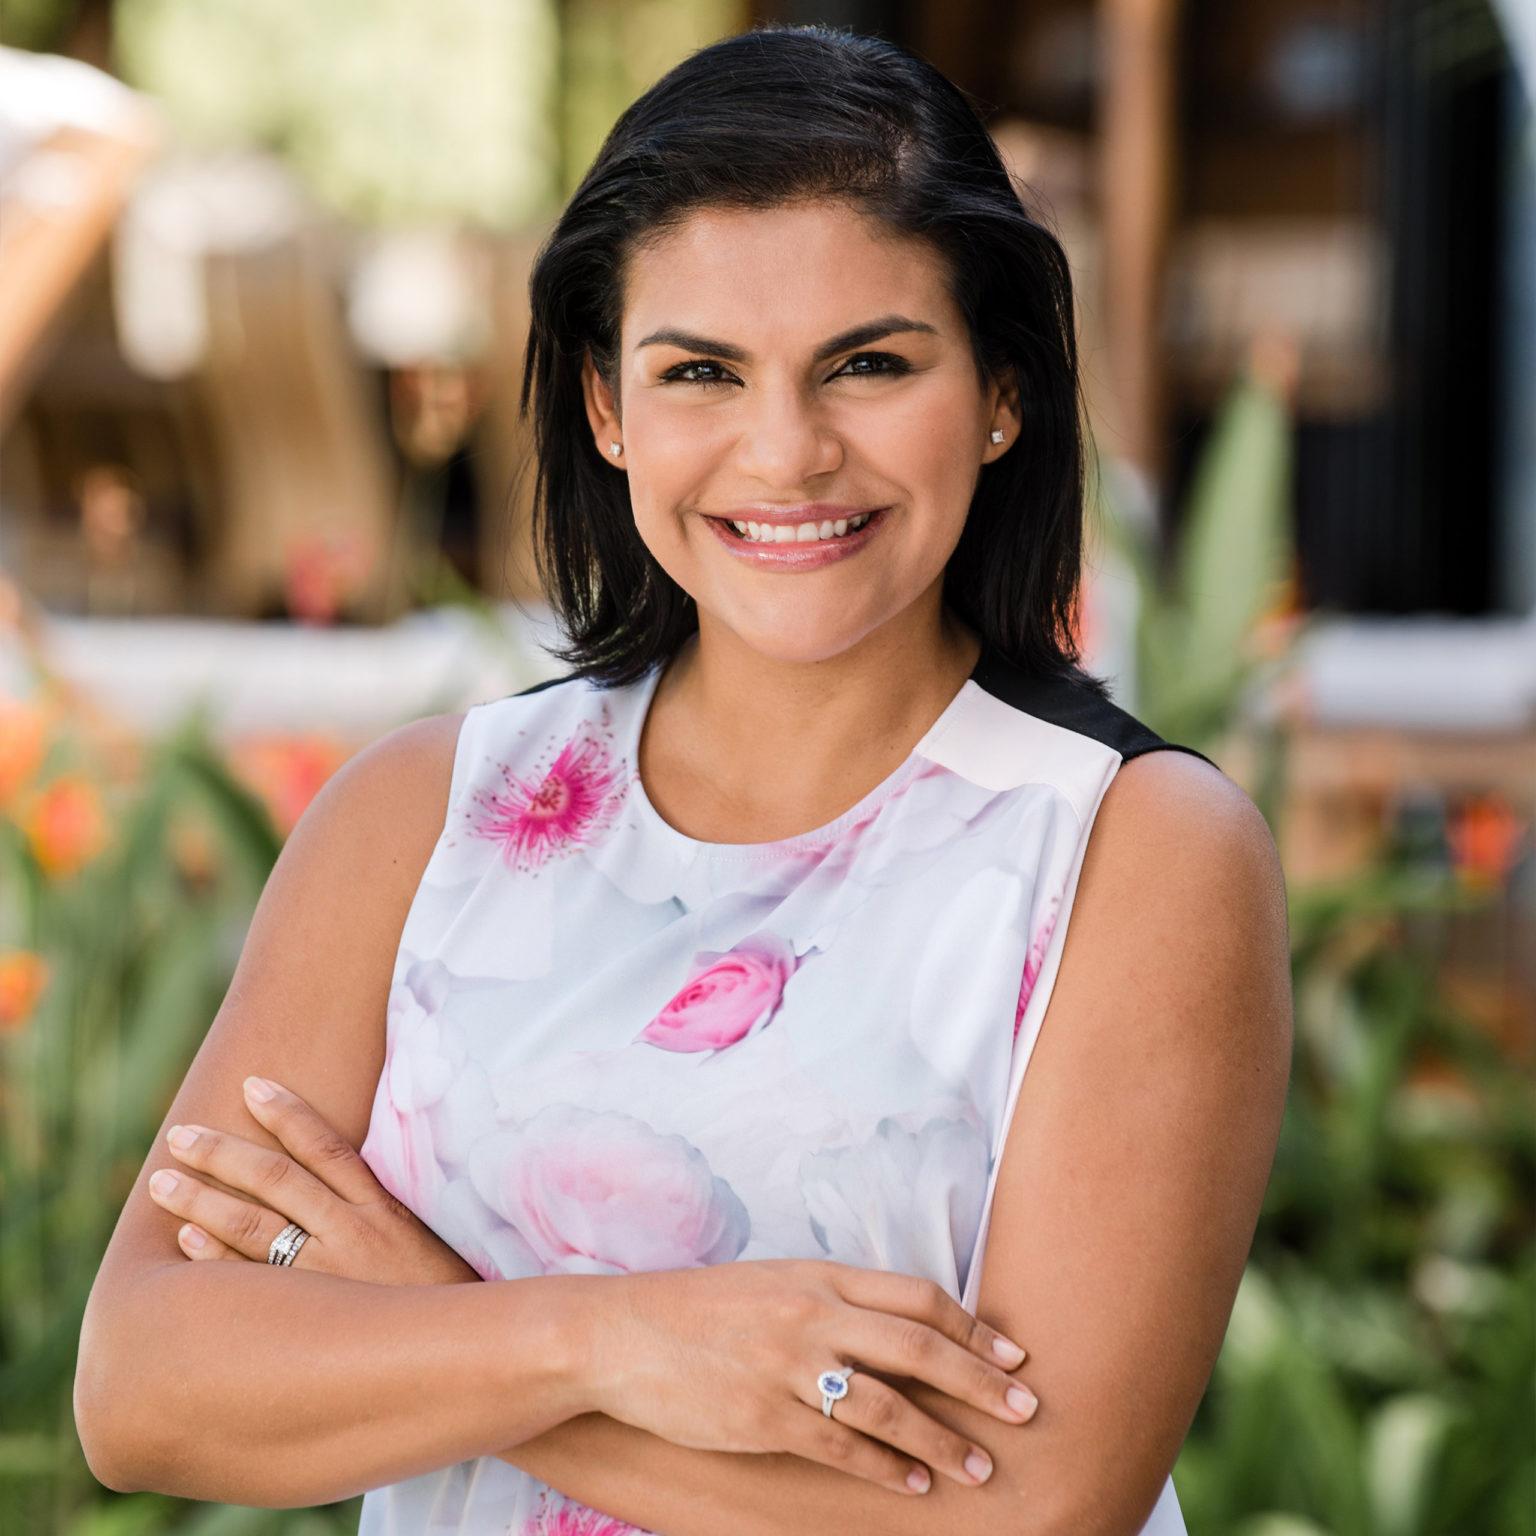 Silene Vega Delgado Owner and CEO